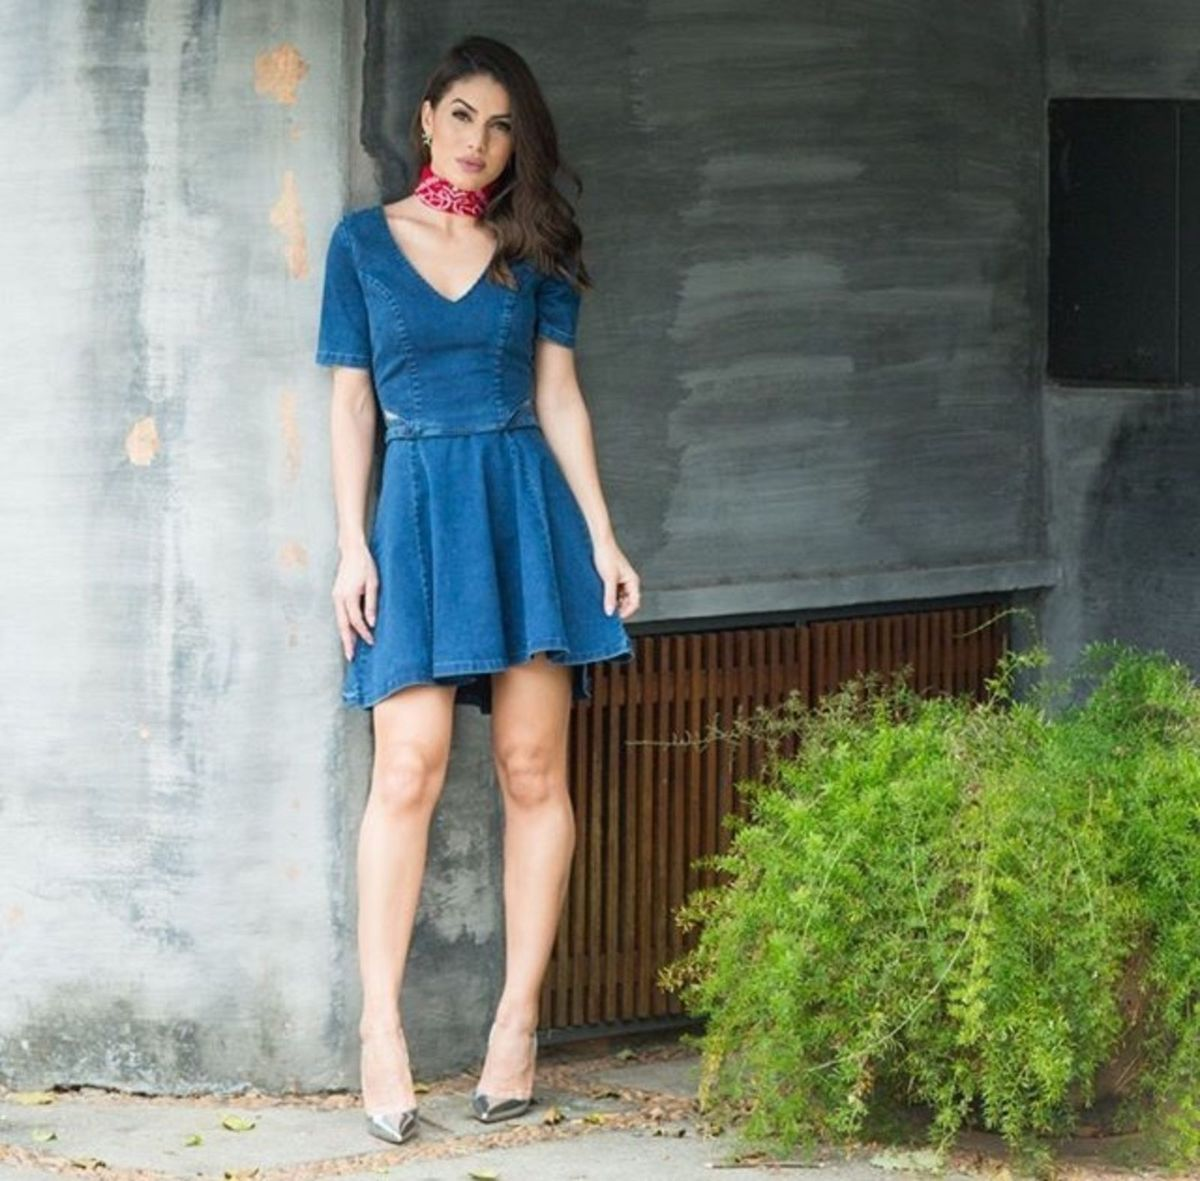 aa2c0f155 Vestido Mini Fit Flare Jeans Damyller   Vestido Feminino Damyller ...